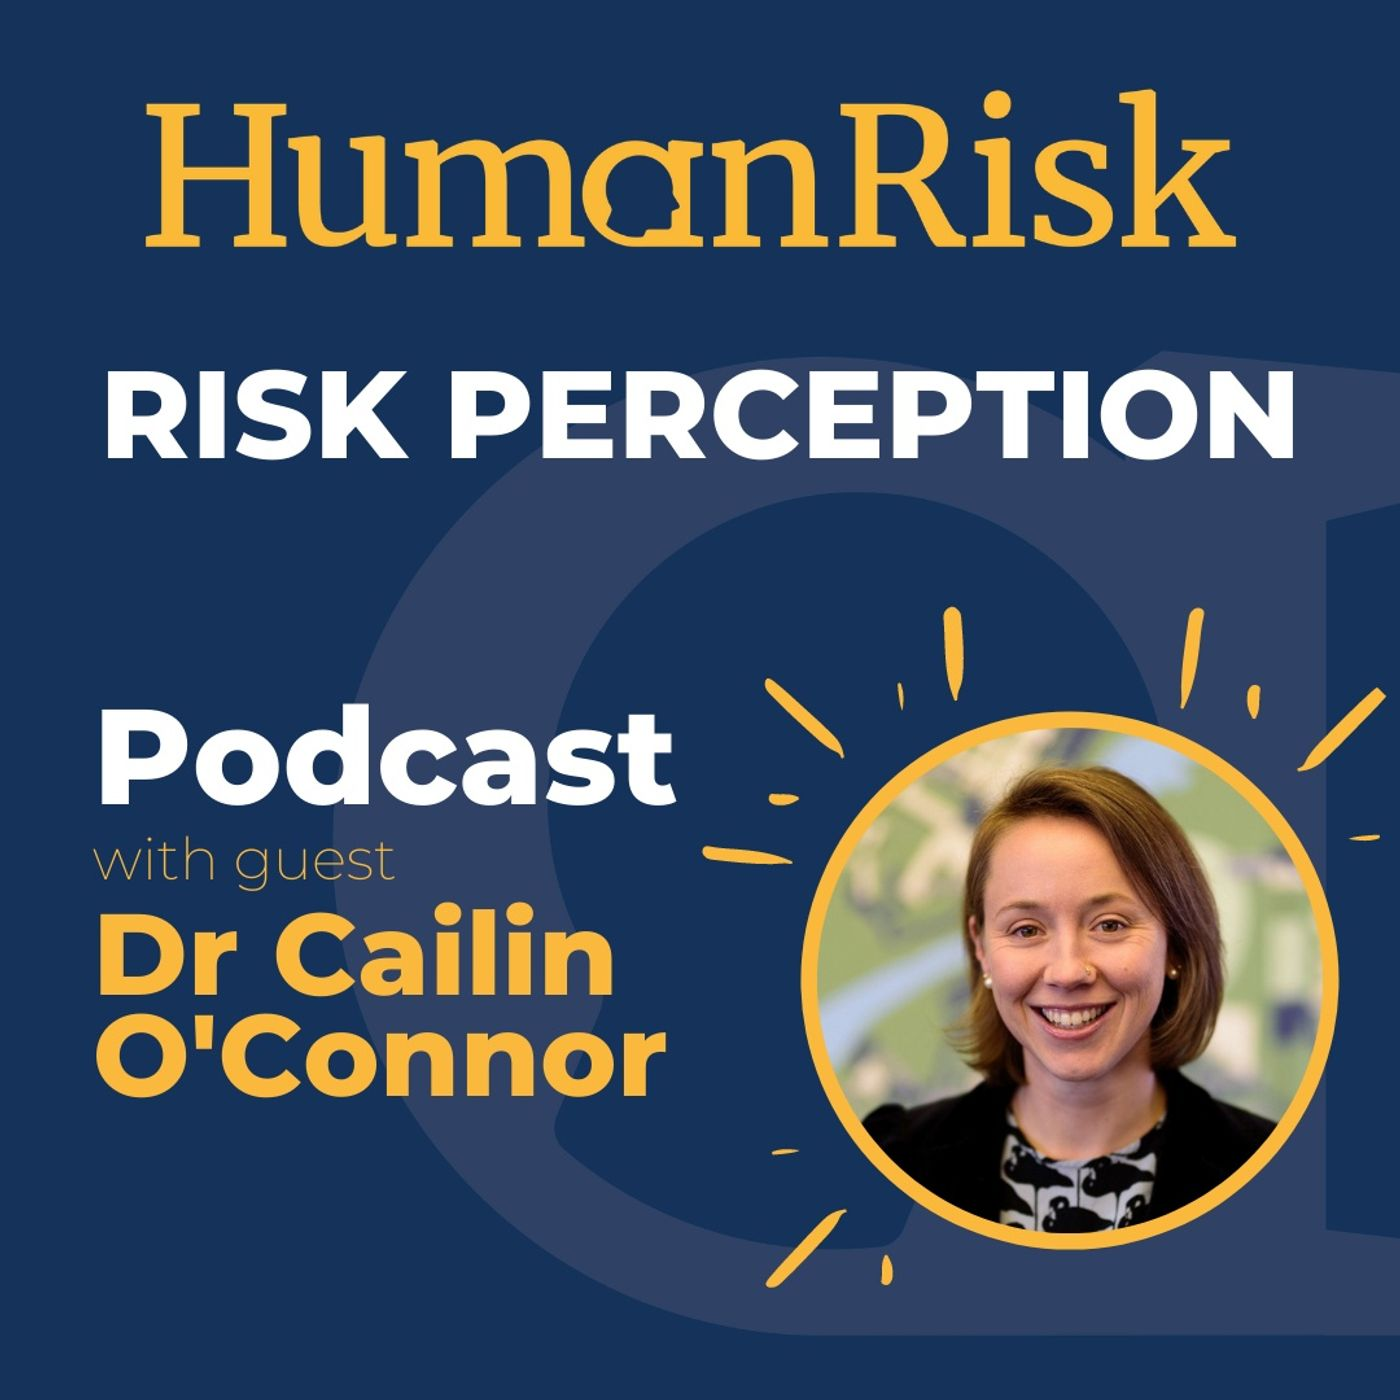 Dr Cailin O'Connor on Risk Perception